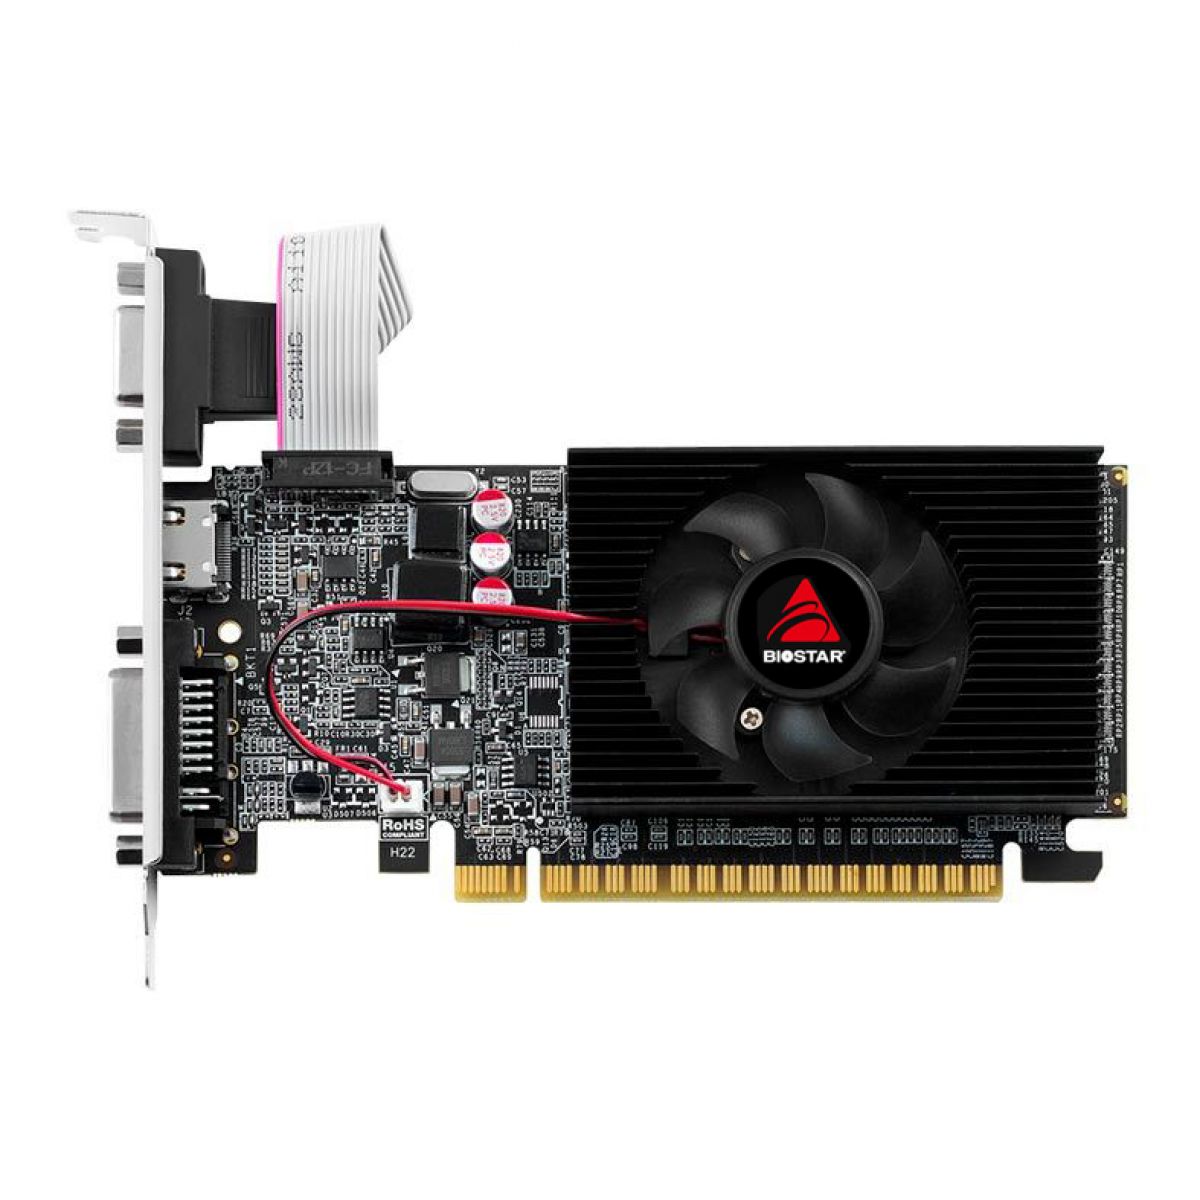 Placa de Vídeo Biostar, GeForce, G210, 1GB, GDDR3, 64bit, VN2103NHG6-TBARL-BS2